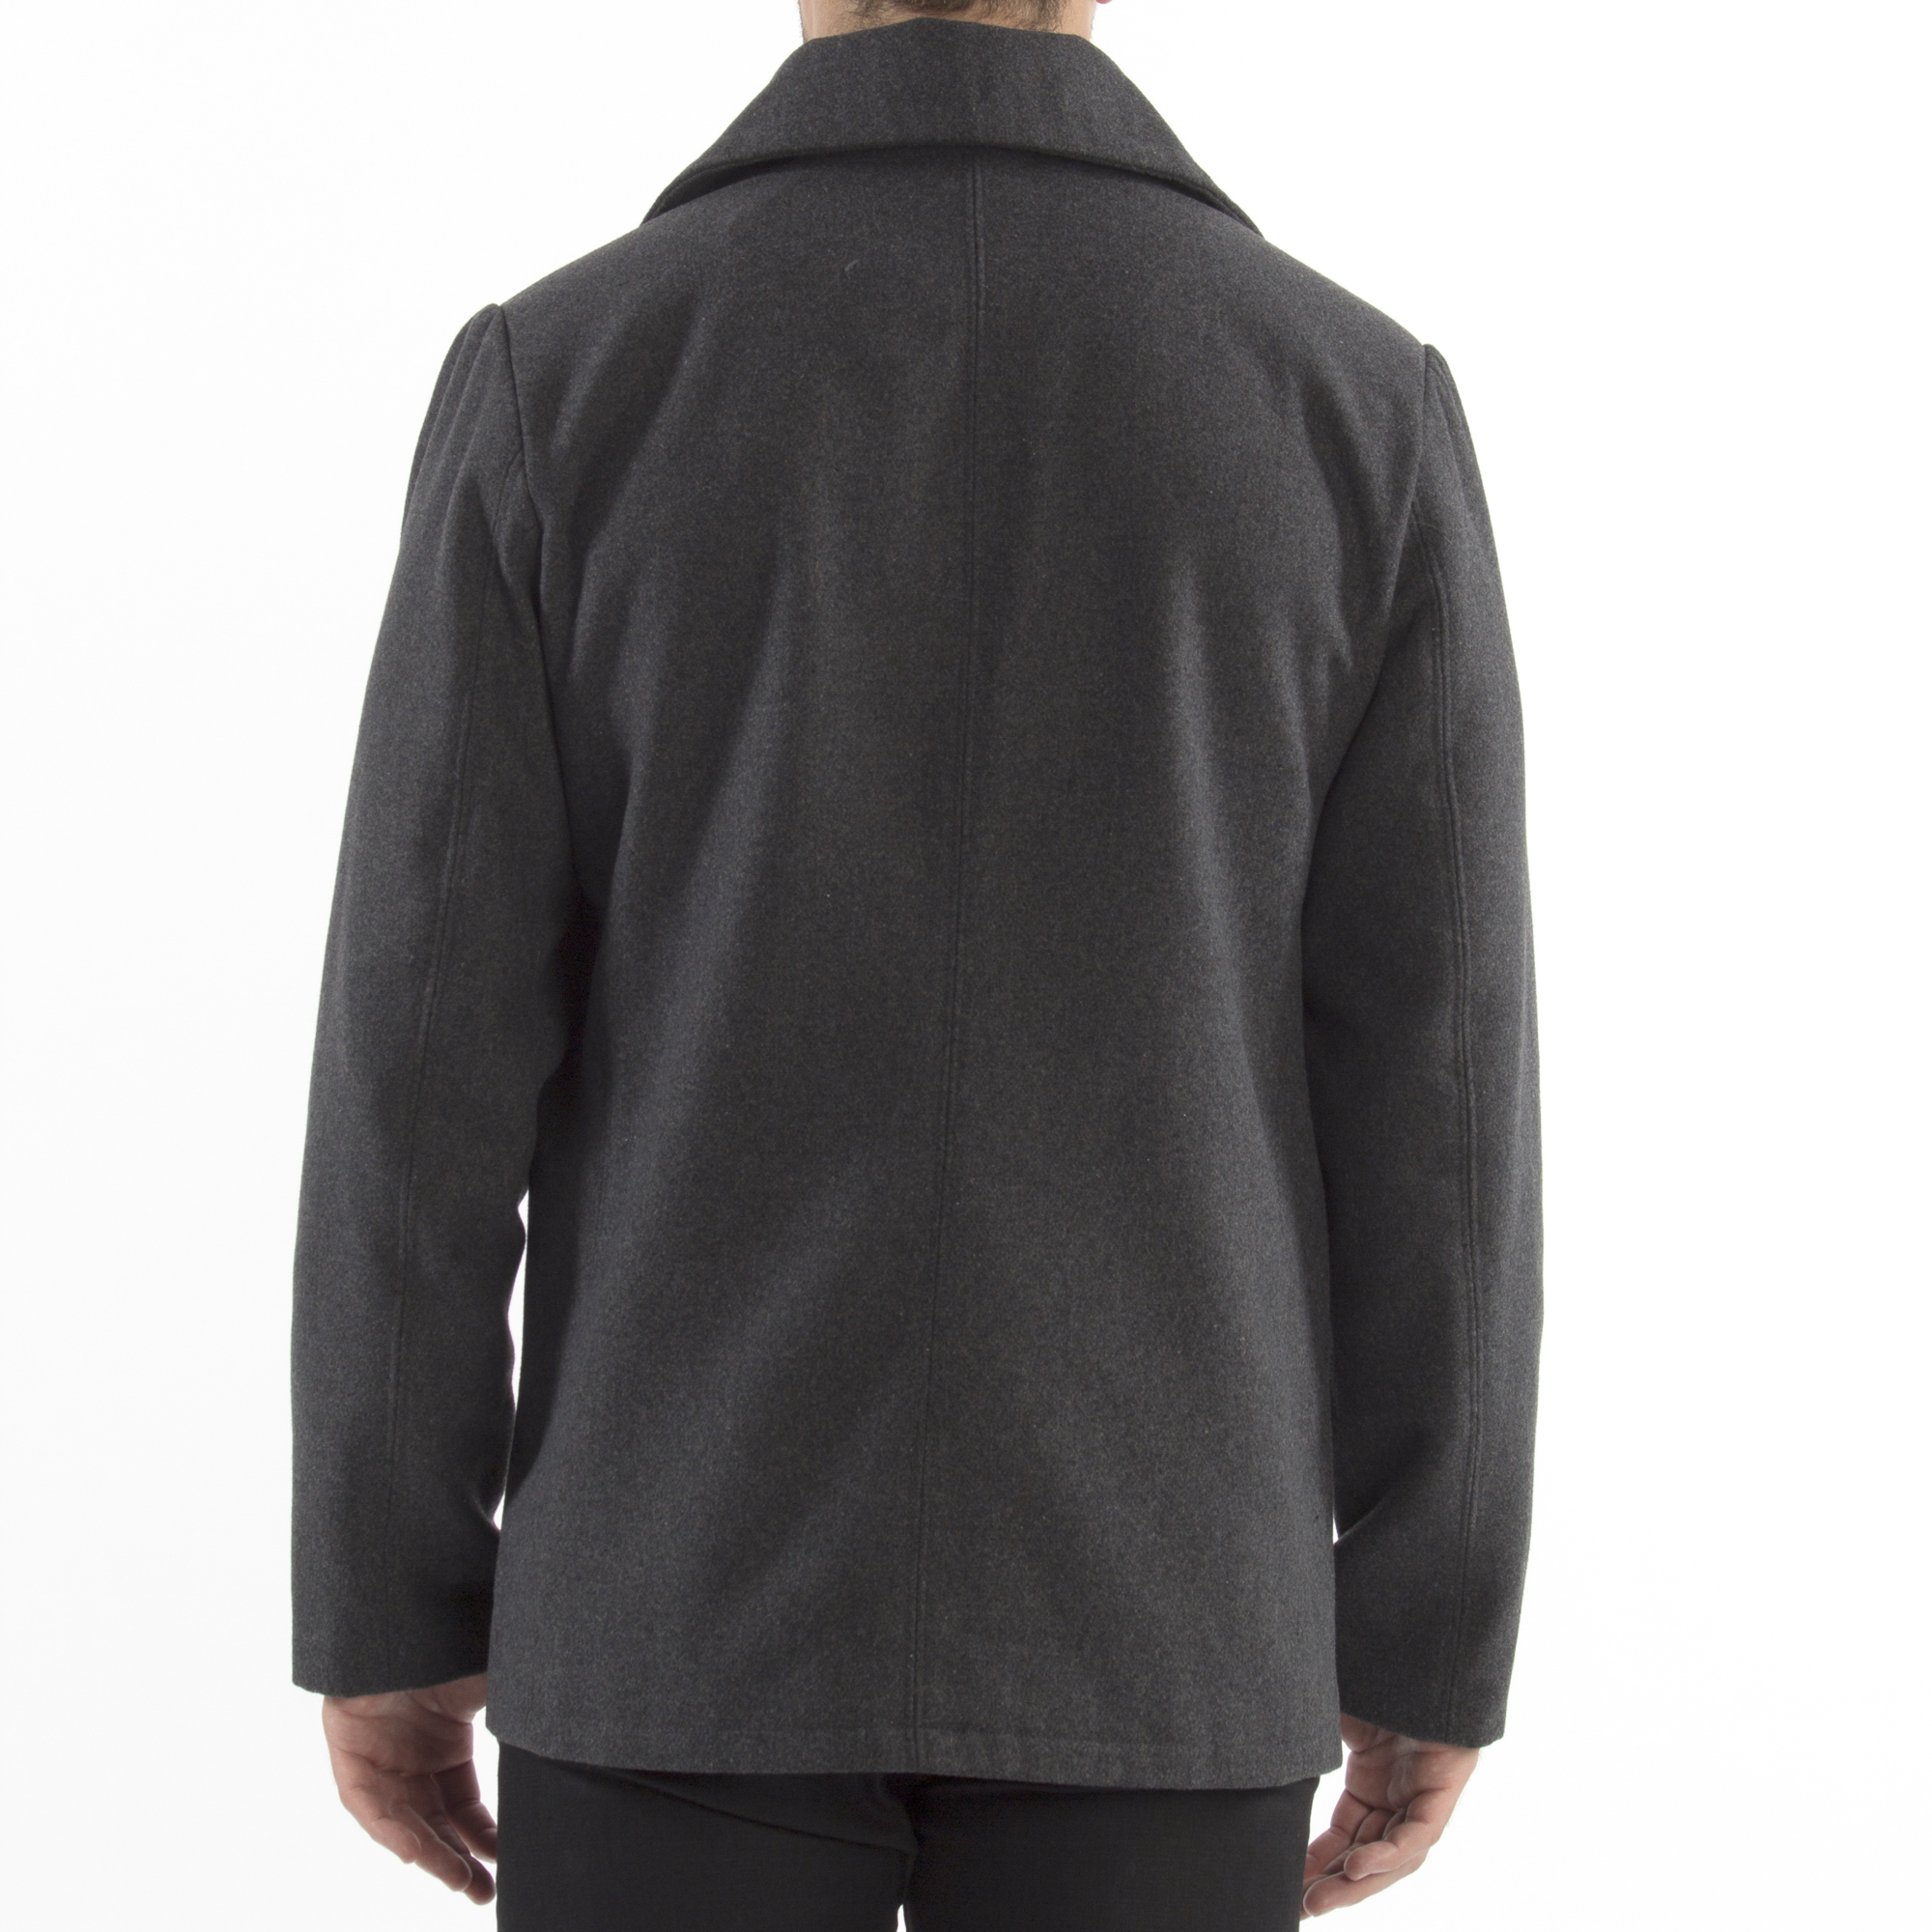 Alpine-Swiss-Mason-Mens-Wool-Blend-Pea-Coat-Jacket-Double-Breasted-Dress-Coat thumbnail 28